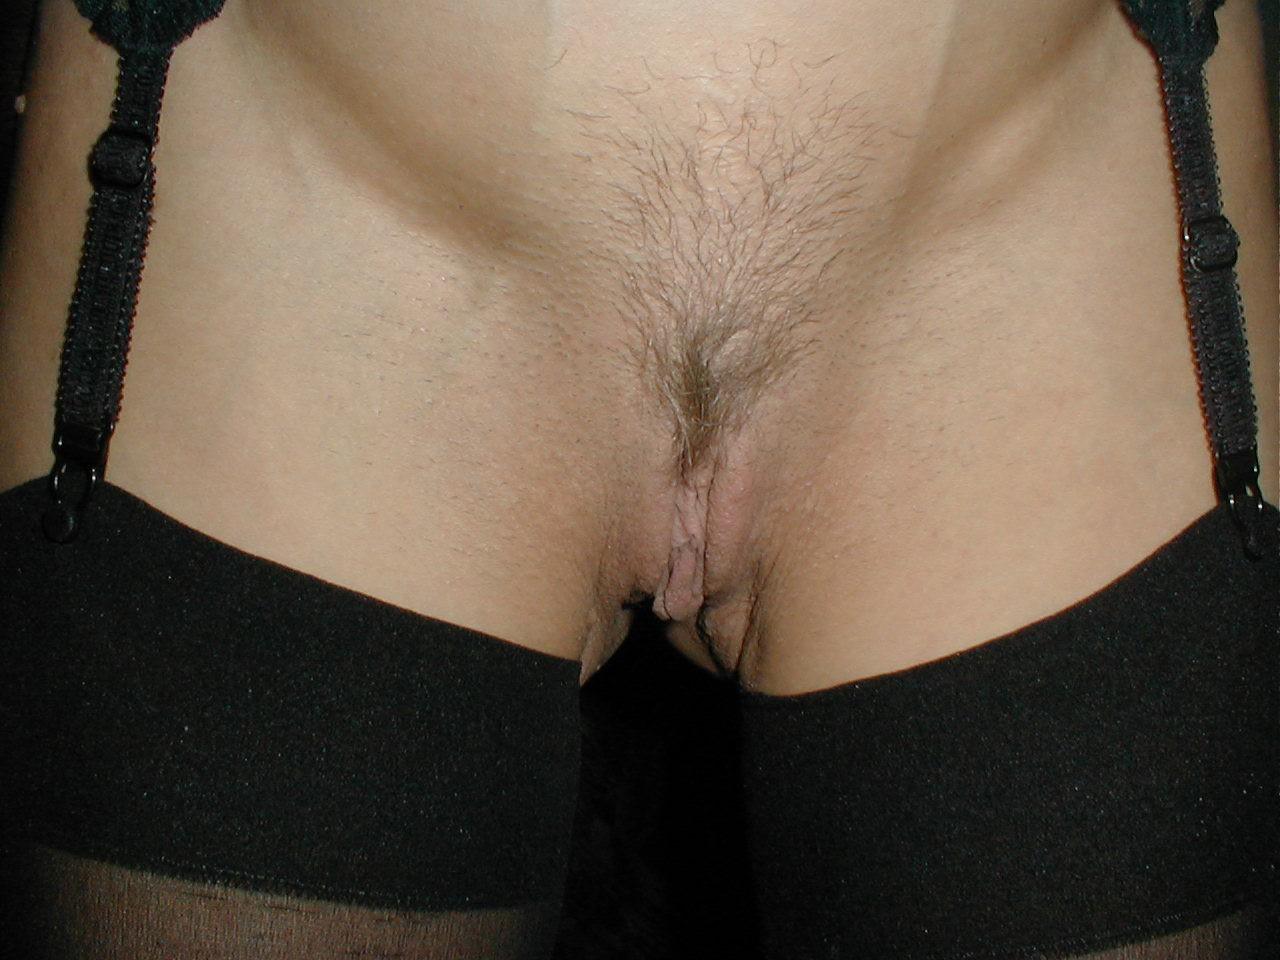 http://pbs-2.adult-empire.com/85/8570/003/pic/1.jpg